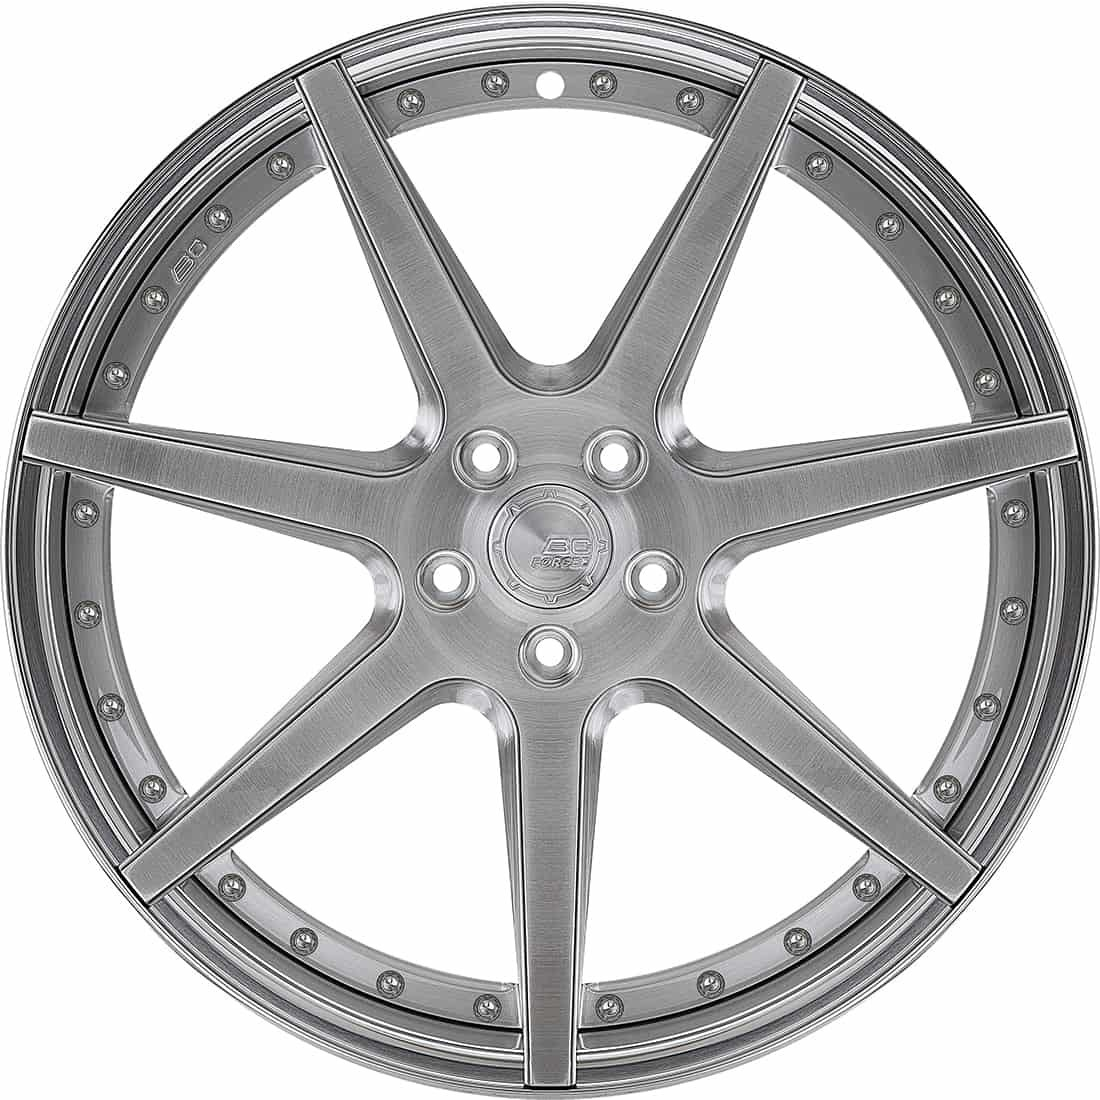 BC Forged wheels HBR7 (HBR Series)